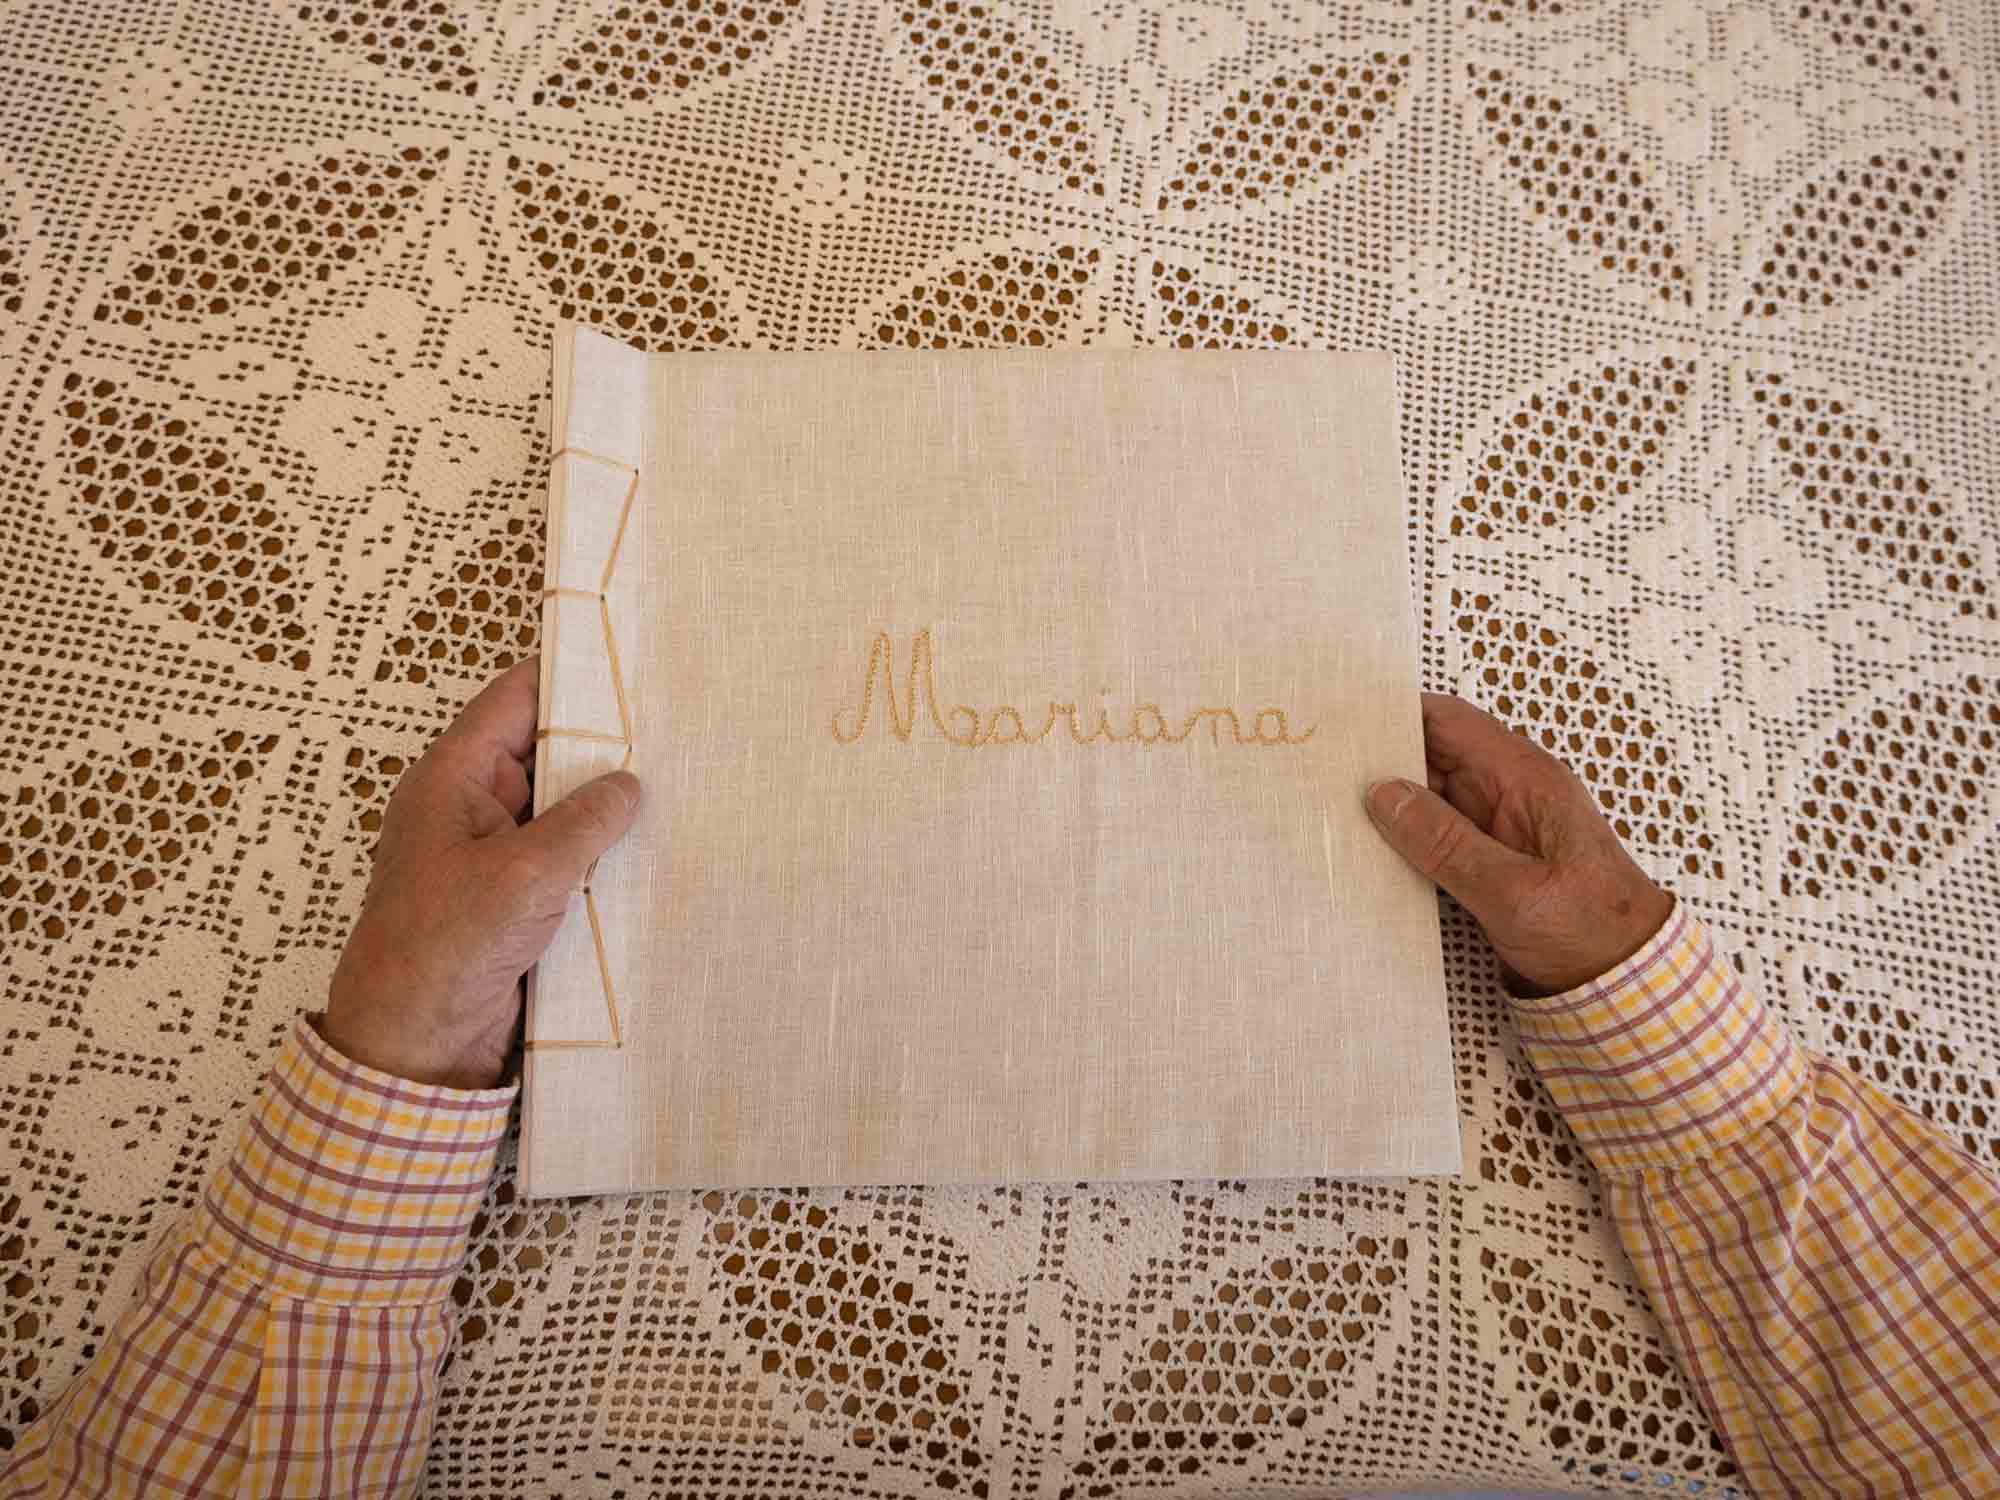 magda-pinto-mariana-02